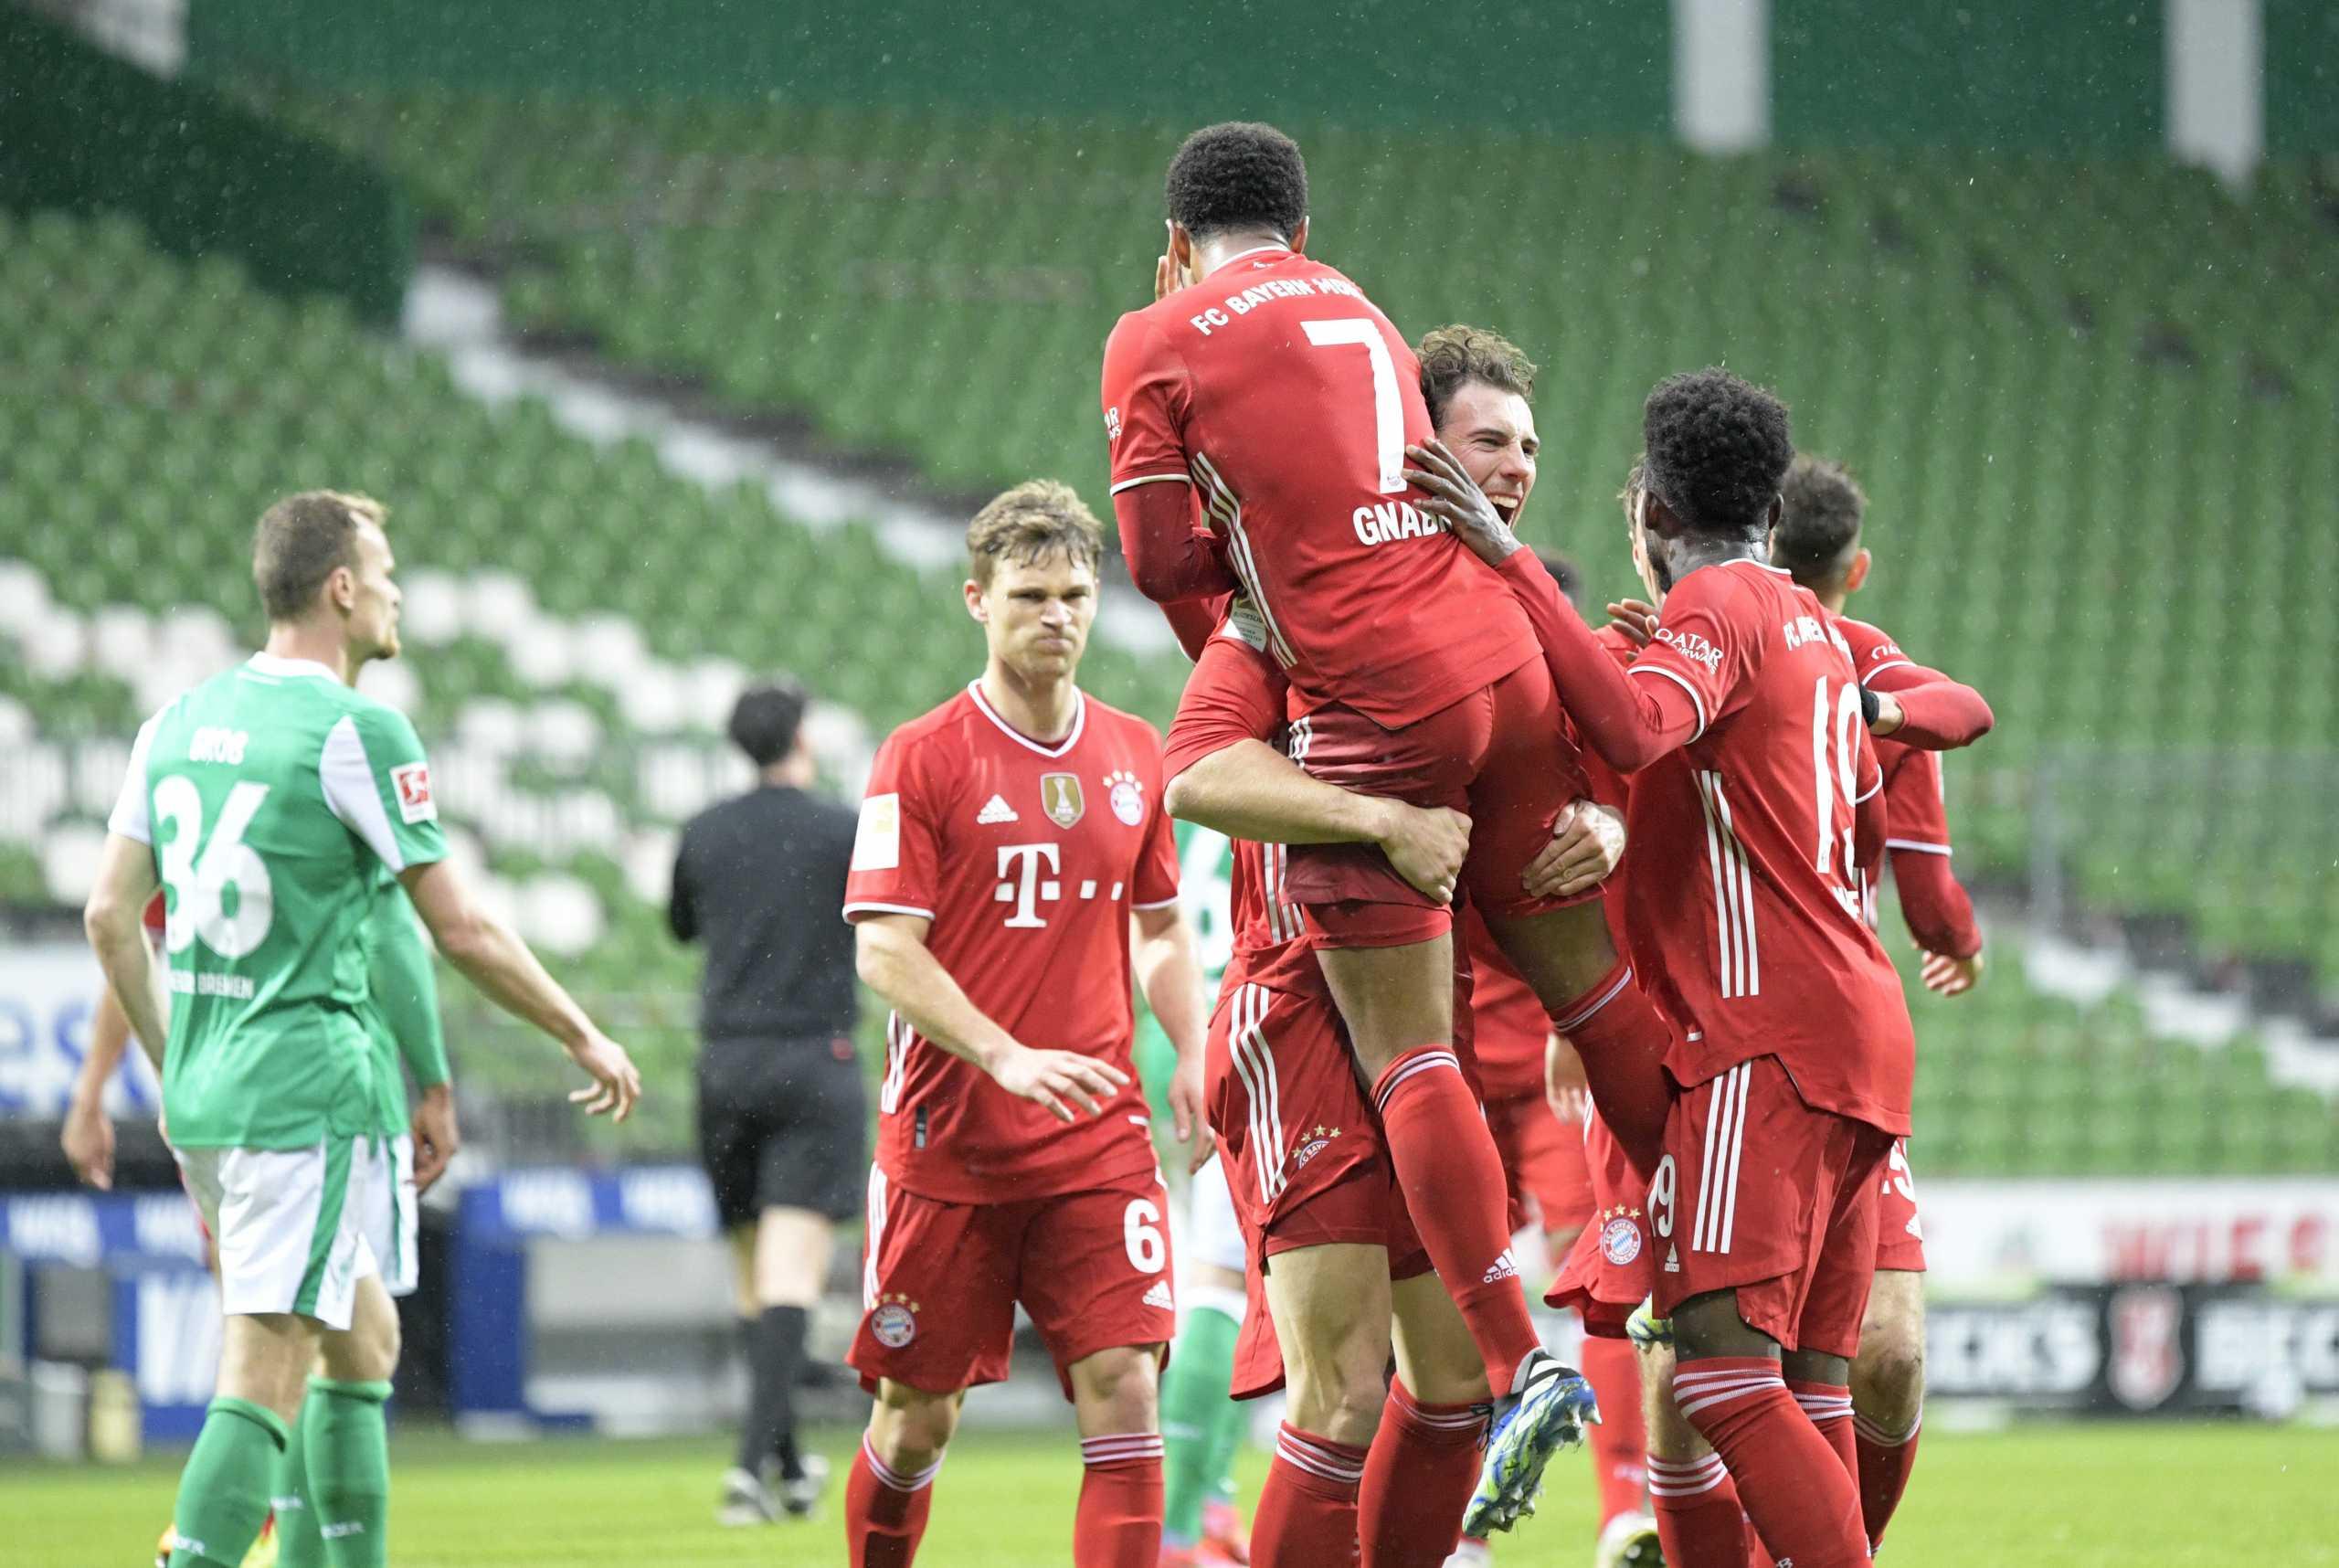 Bundesliga: Εύκολα η Μπάγερν – «Διασυρμός» για τη Σάλκε του Γραμμόζη (videos)